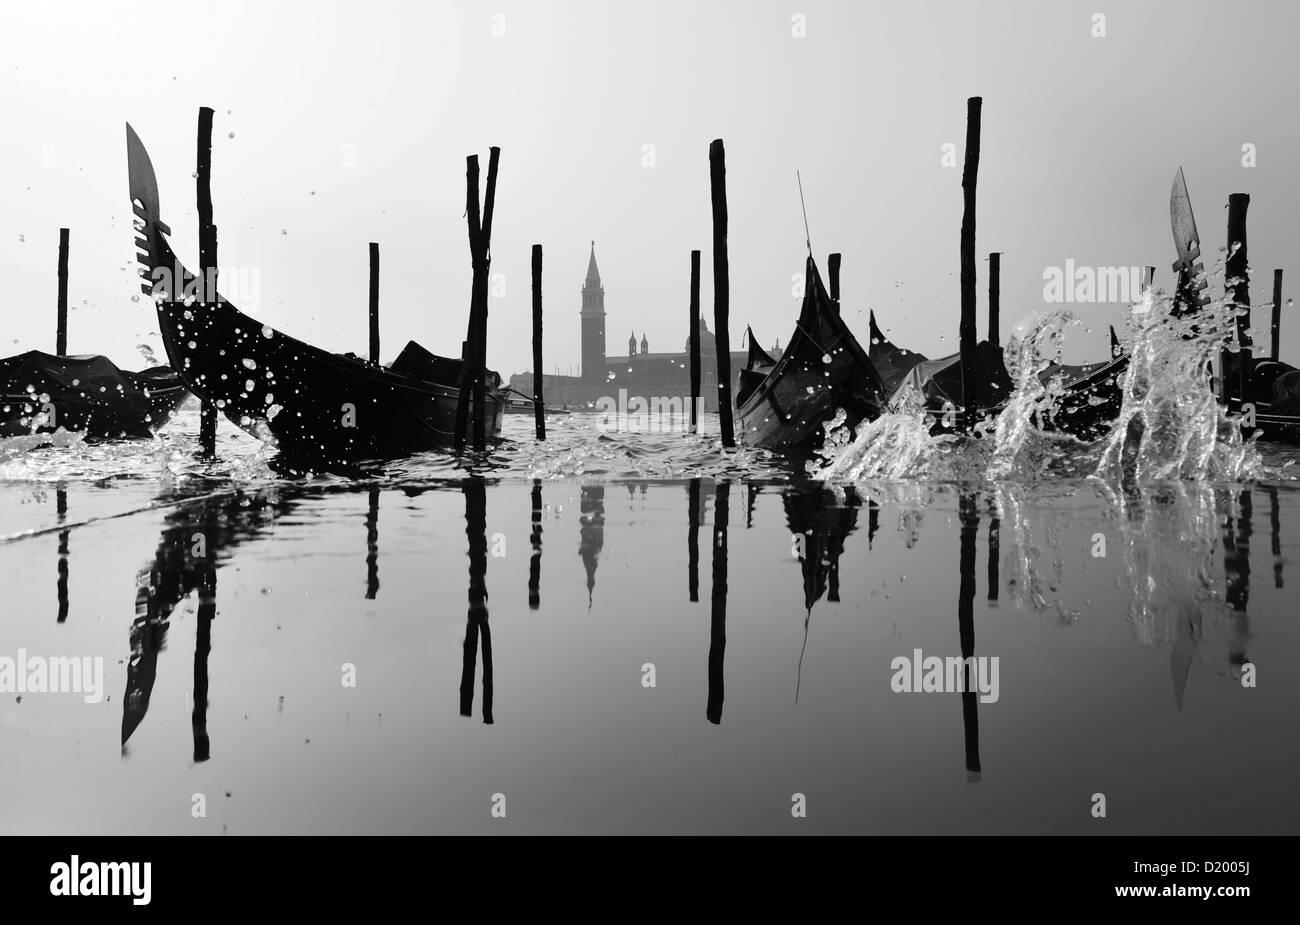 Gondeln, Wasser-Spray, San Giorgio Maggiore, Venedig, Italien Stockbild